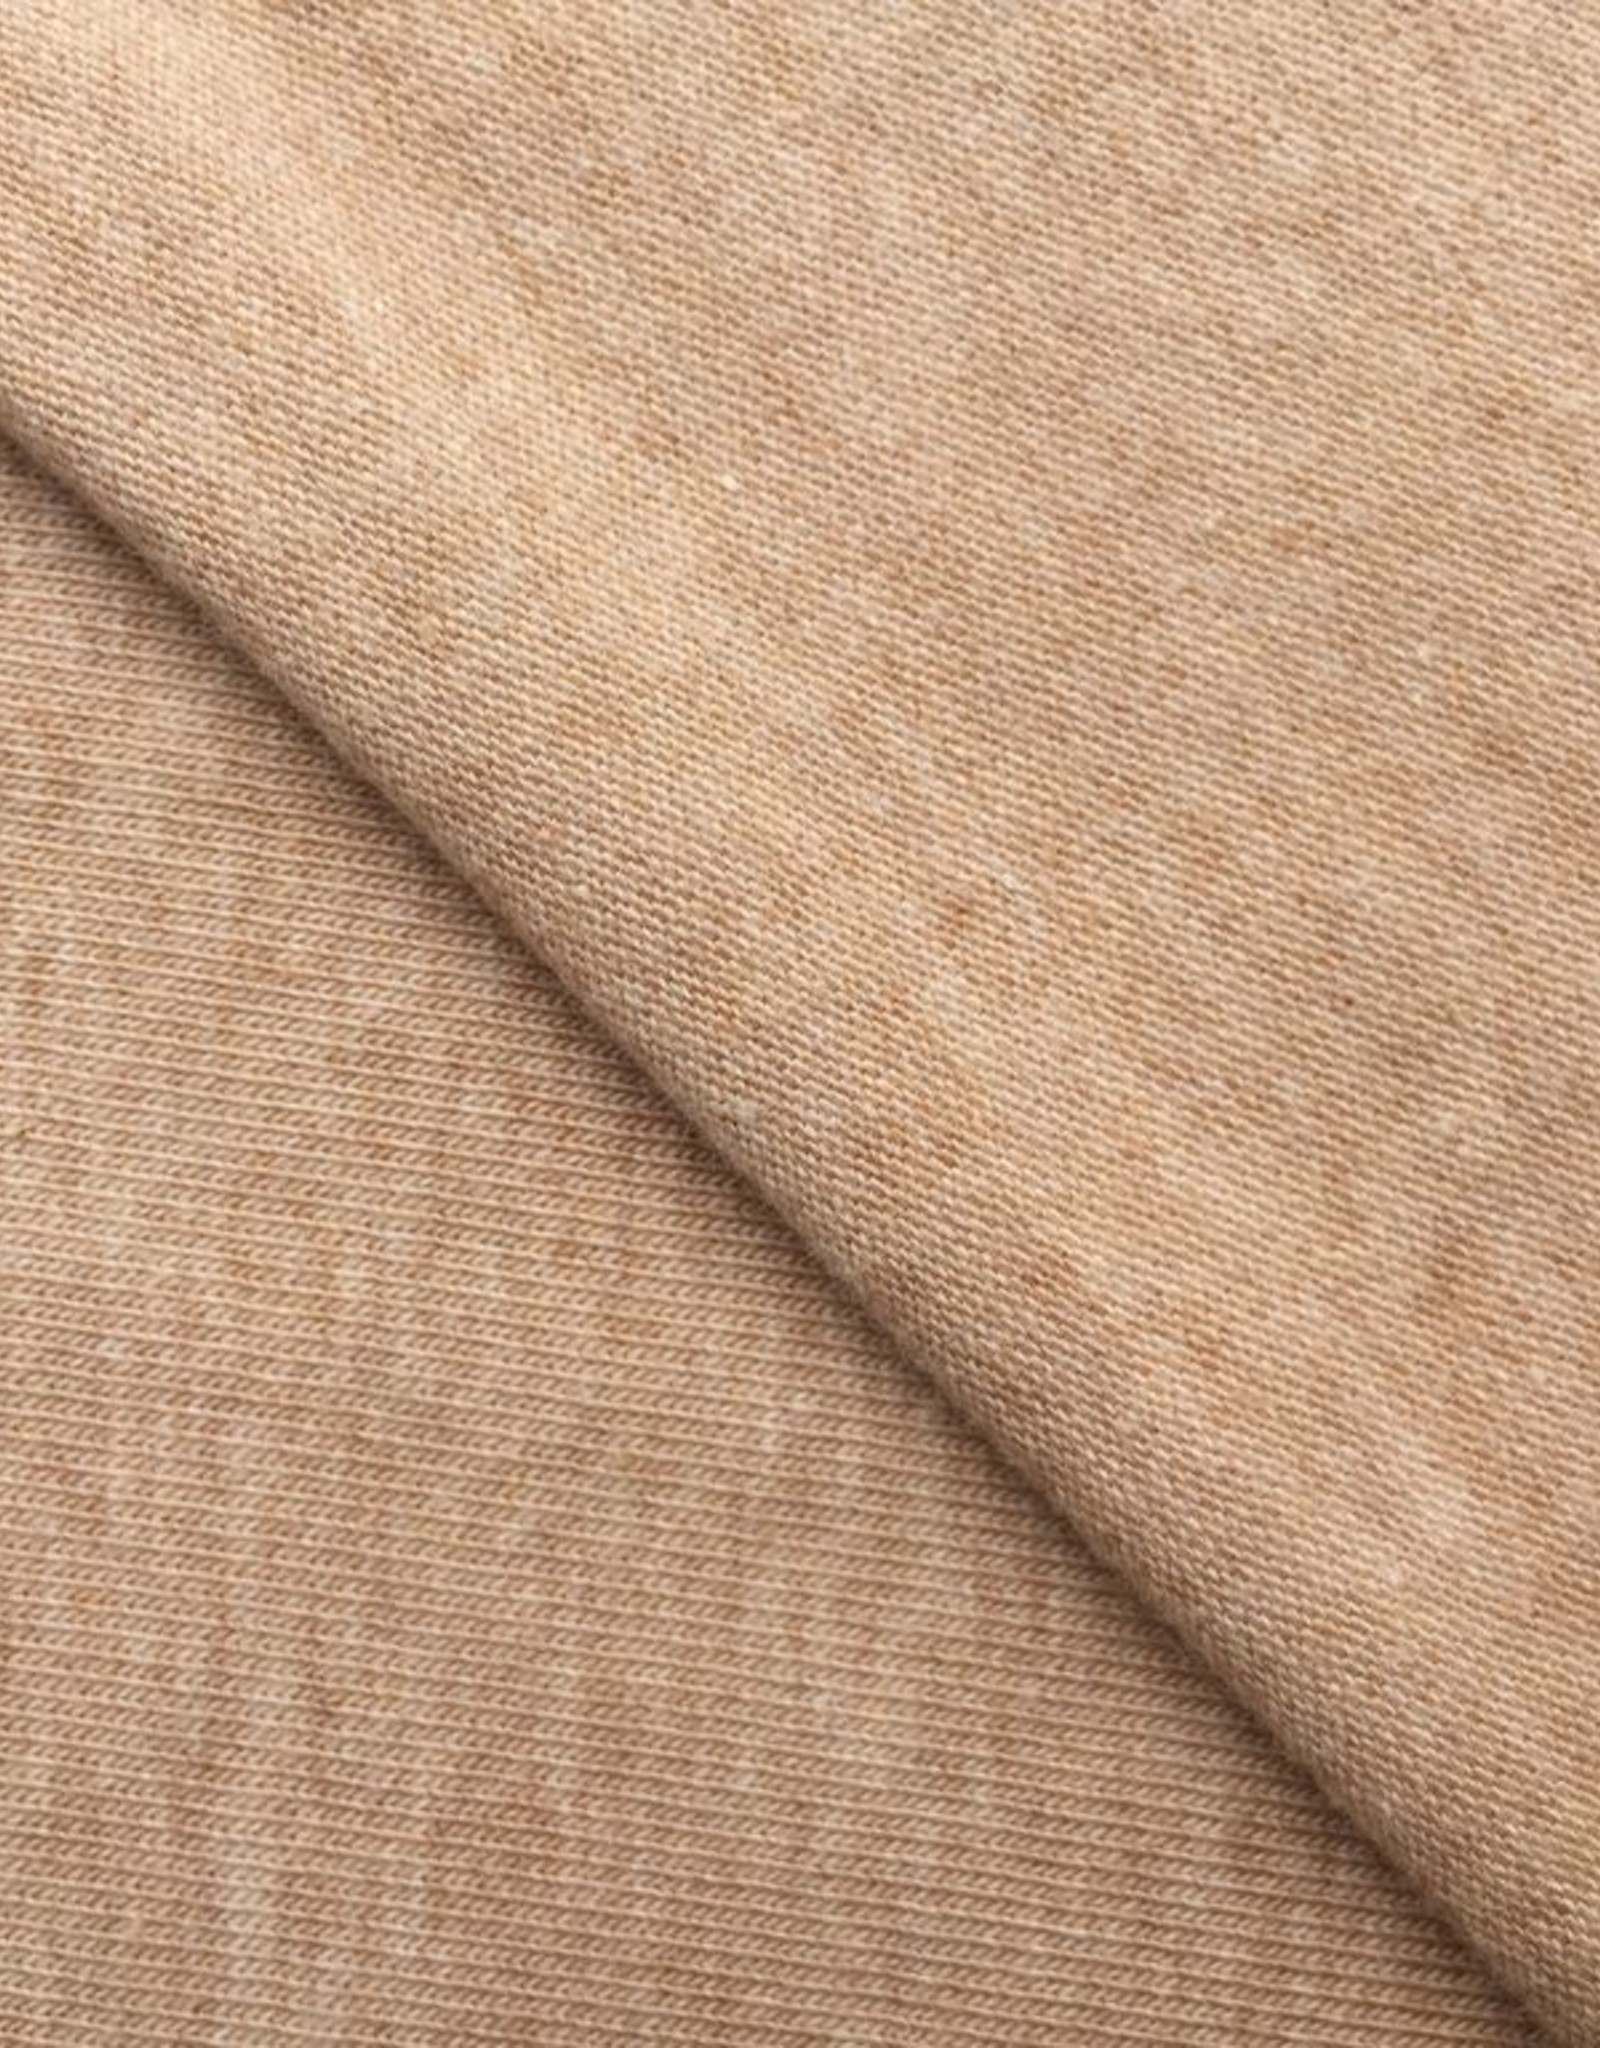 single jersey brown OCCGuarantee 160grs.